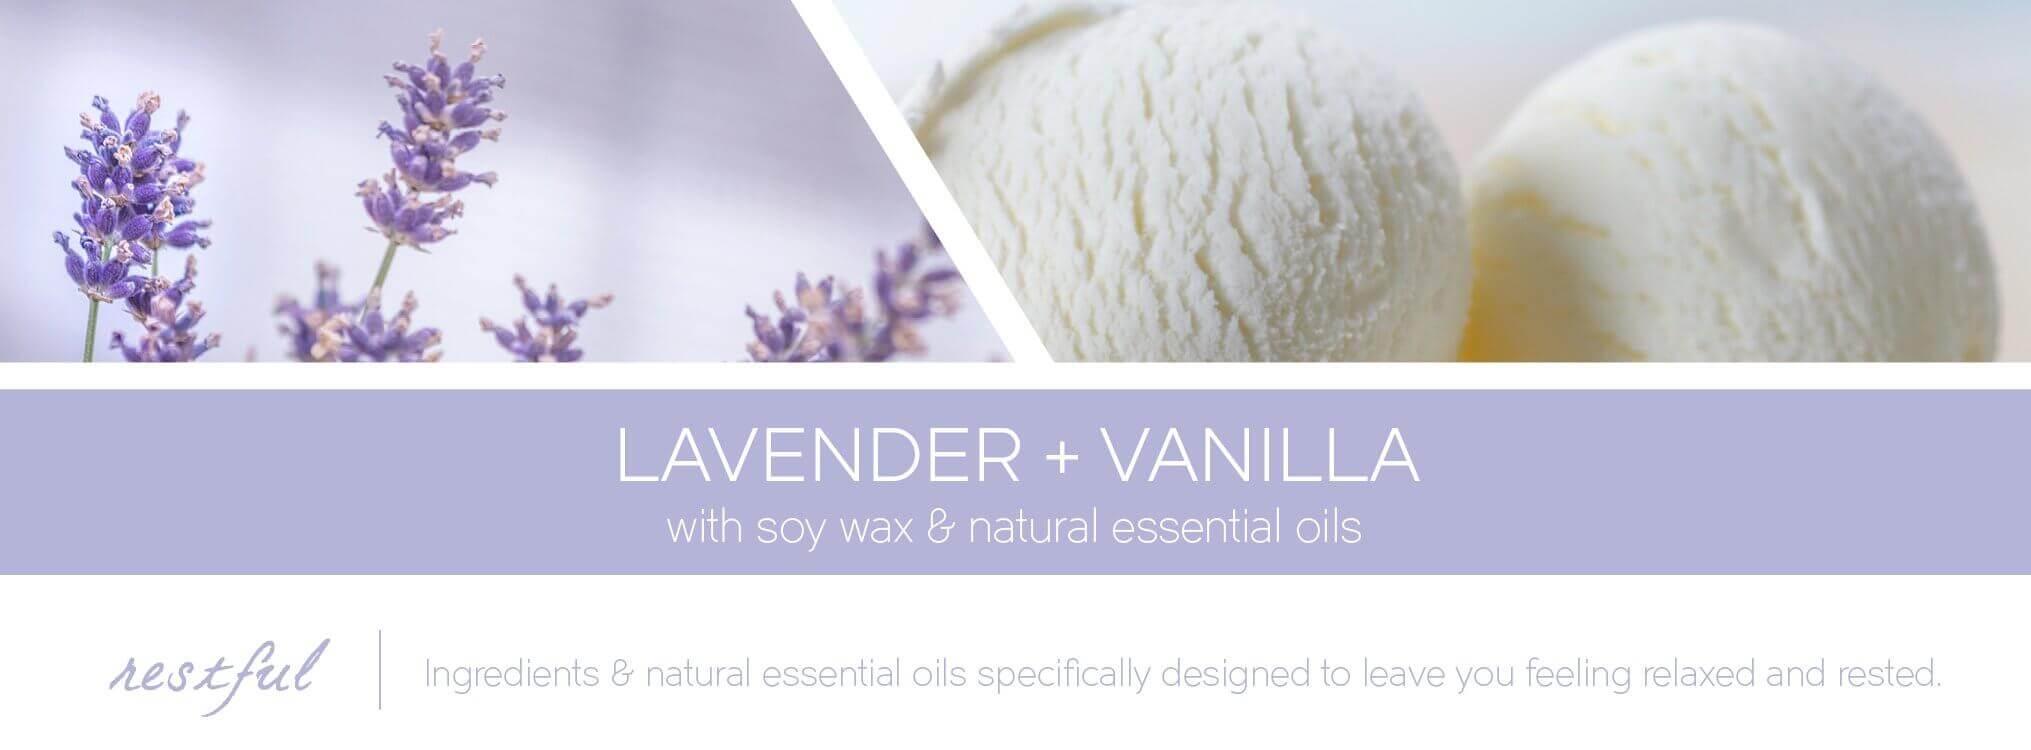 Lavender-_-Vanilla-Candle-Fragrance